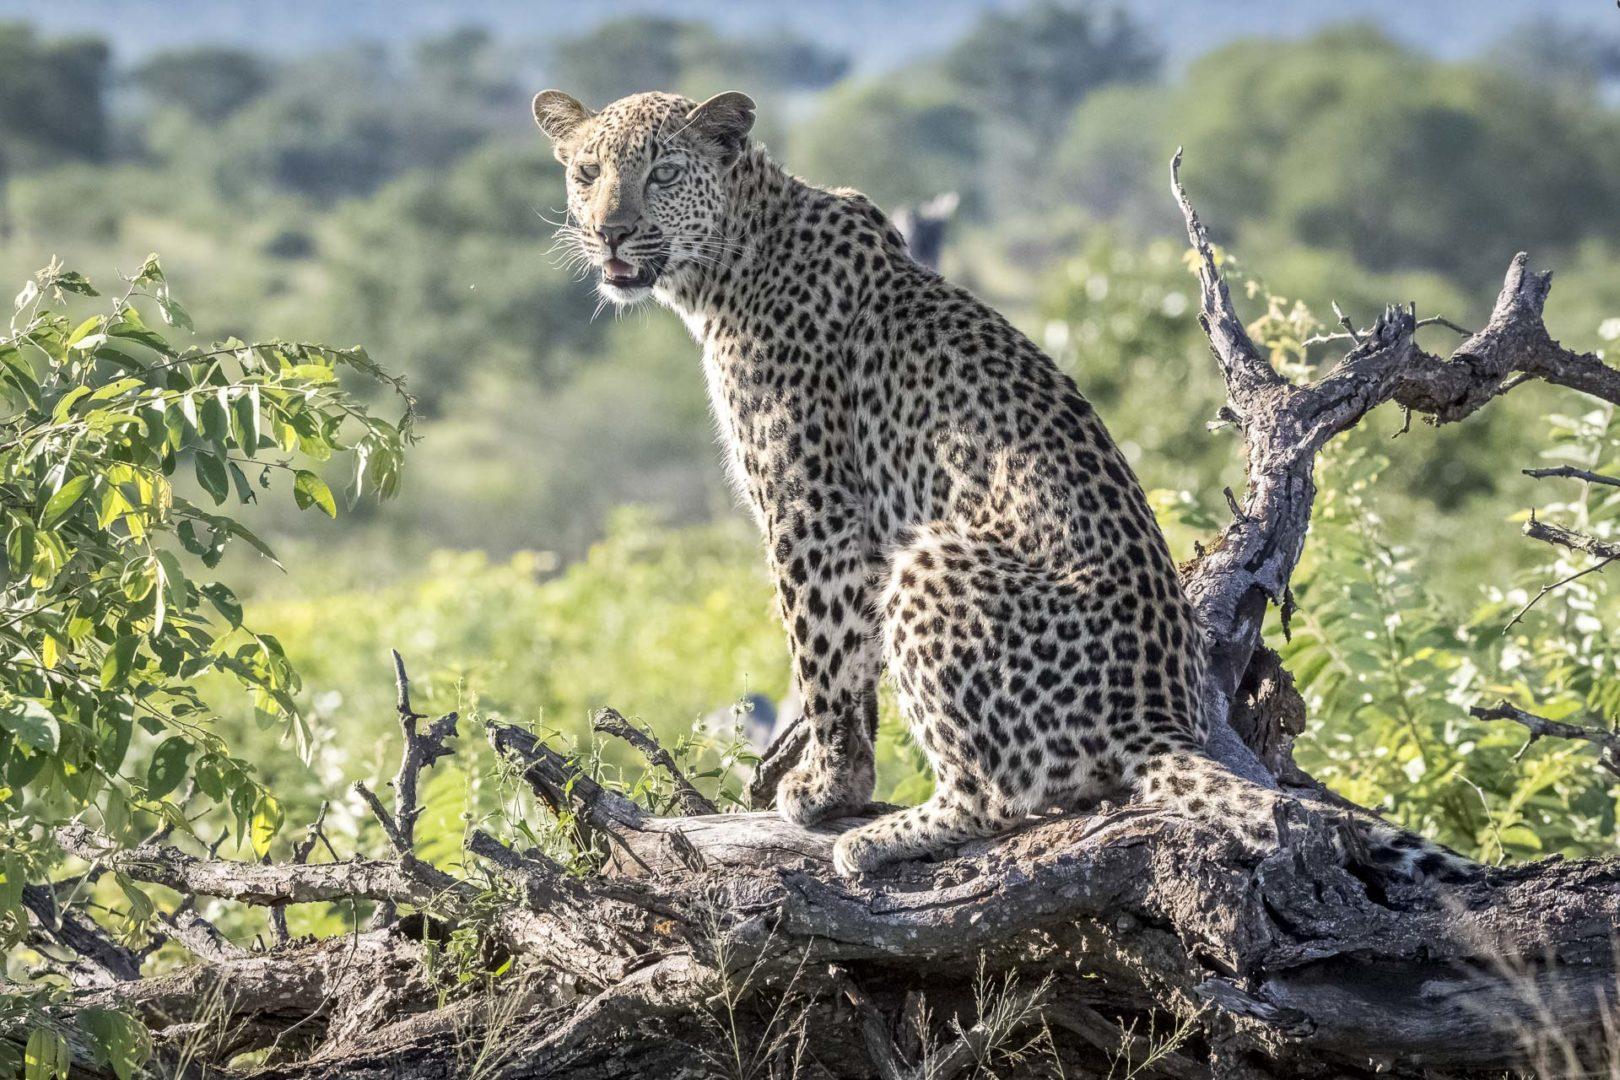 Skukuza Safari Lodge  and Private Safari image of a Leopard on a log